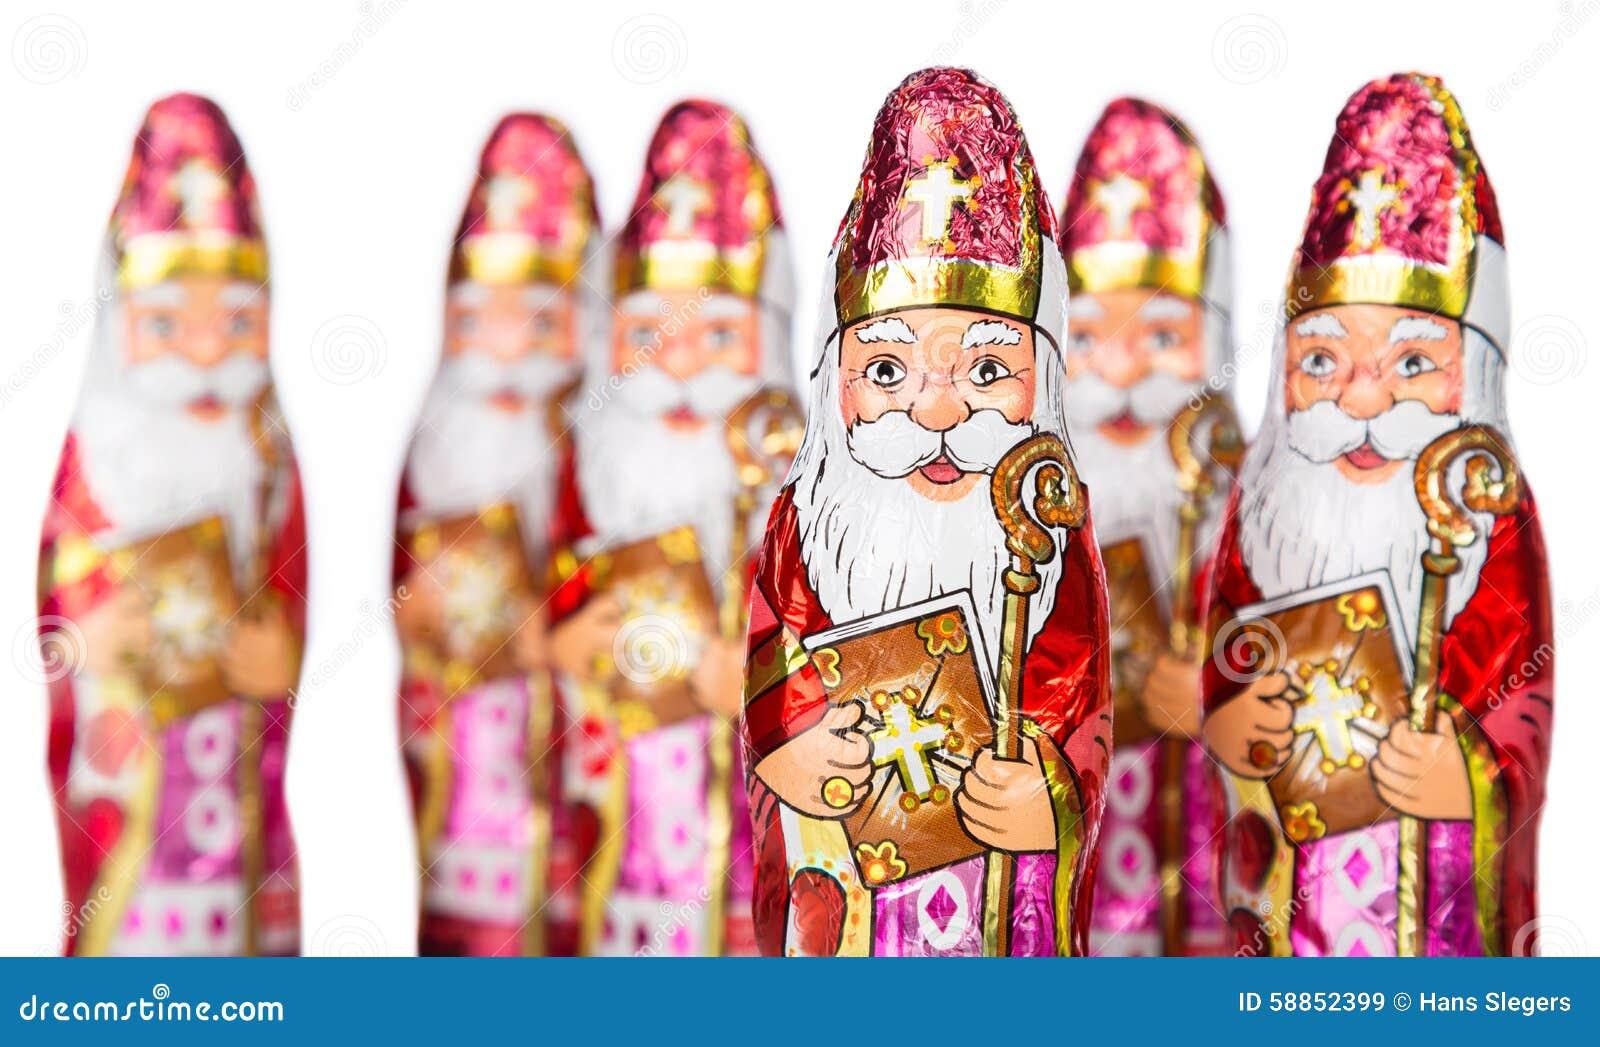 The Real Santa Claus: Saint Nicholas, Man of God